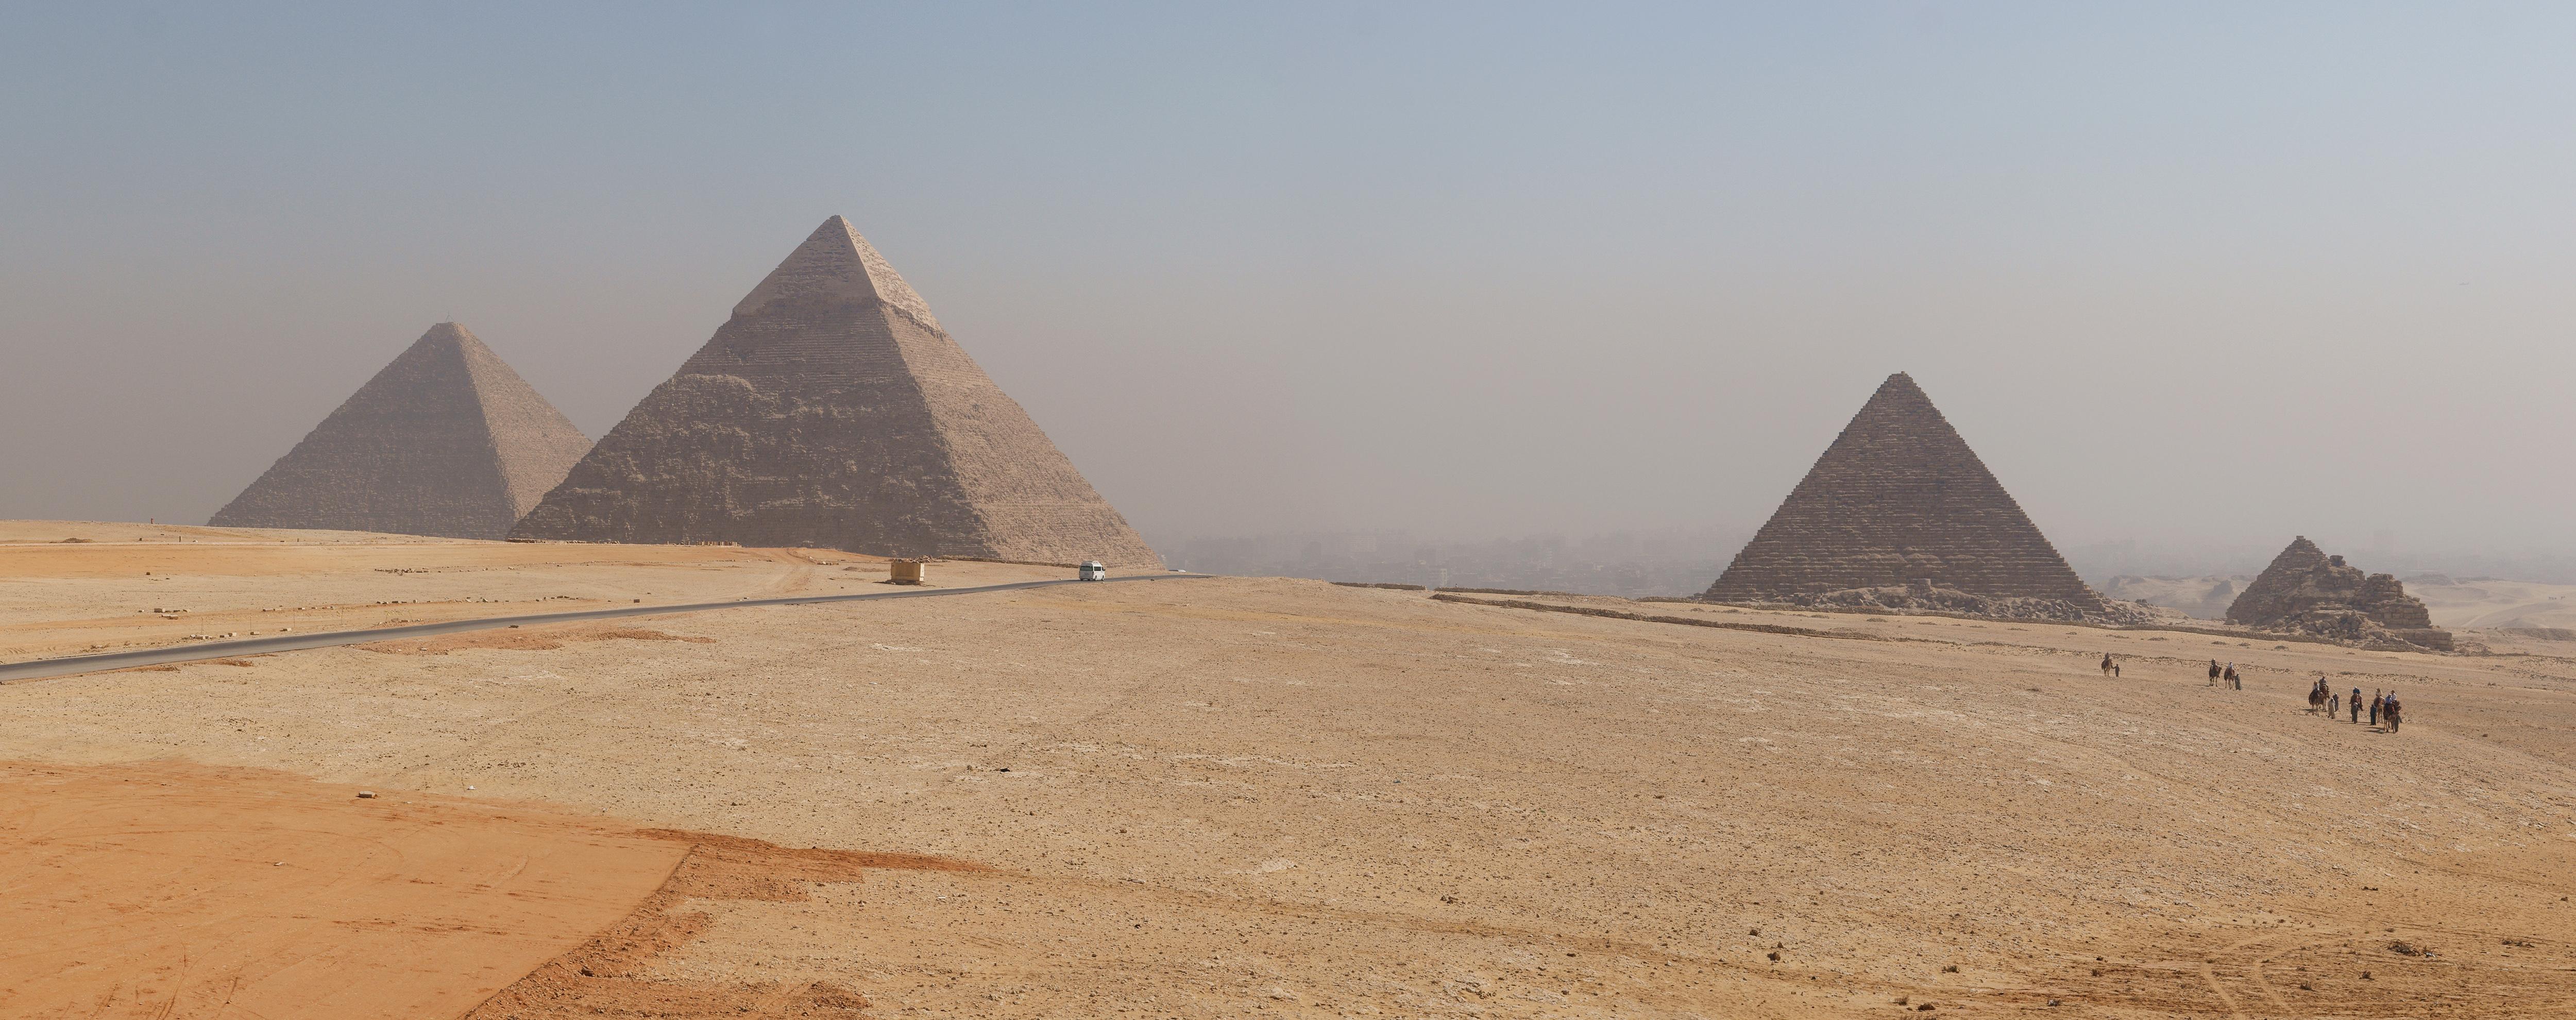 pyramids of egypt wiki